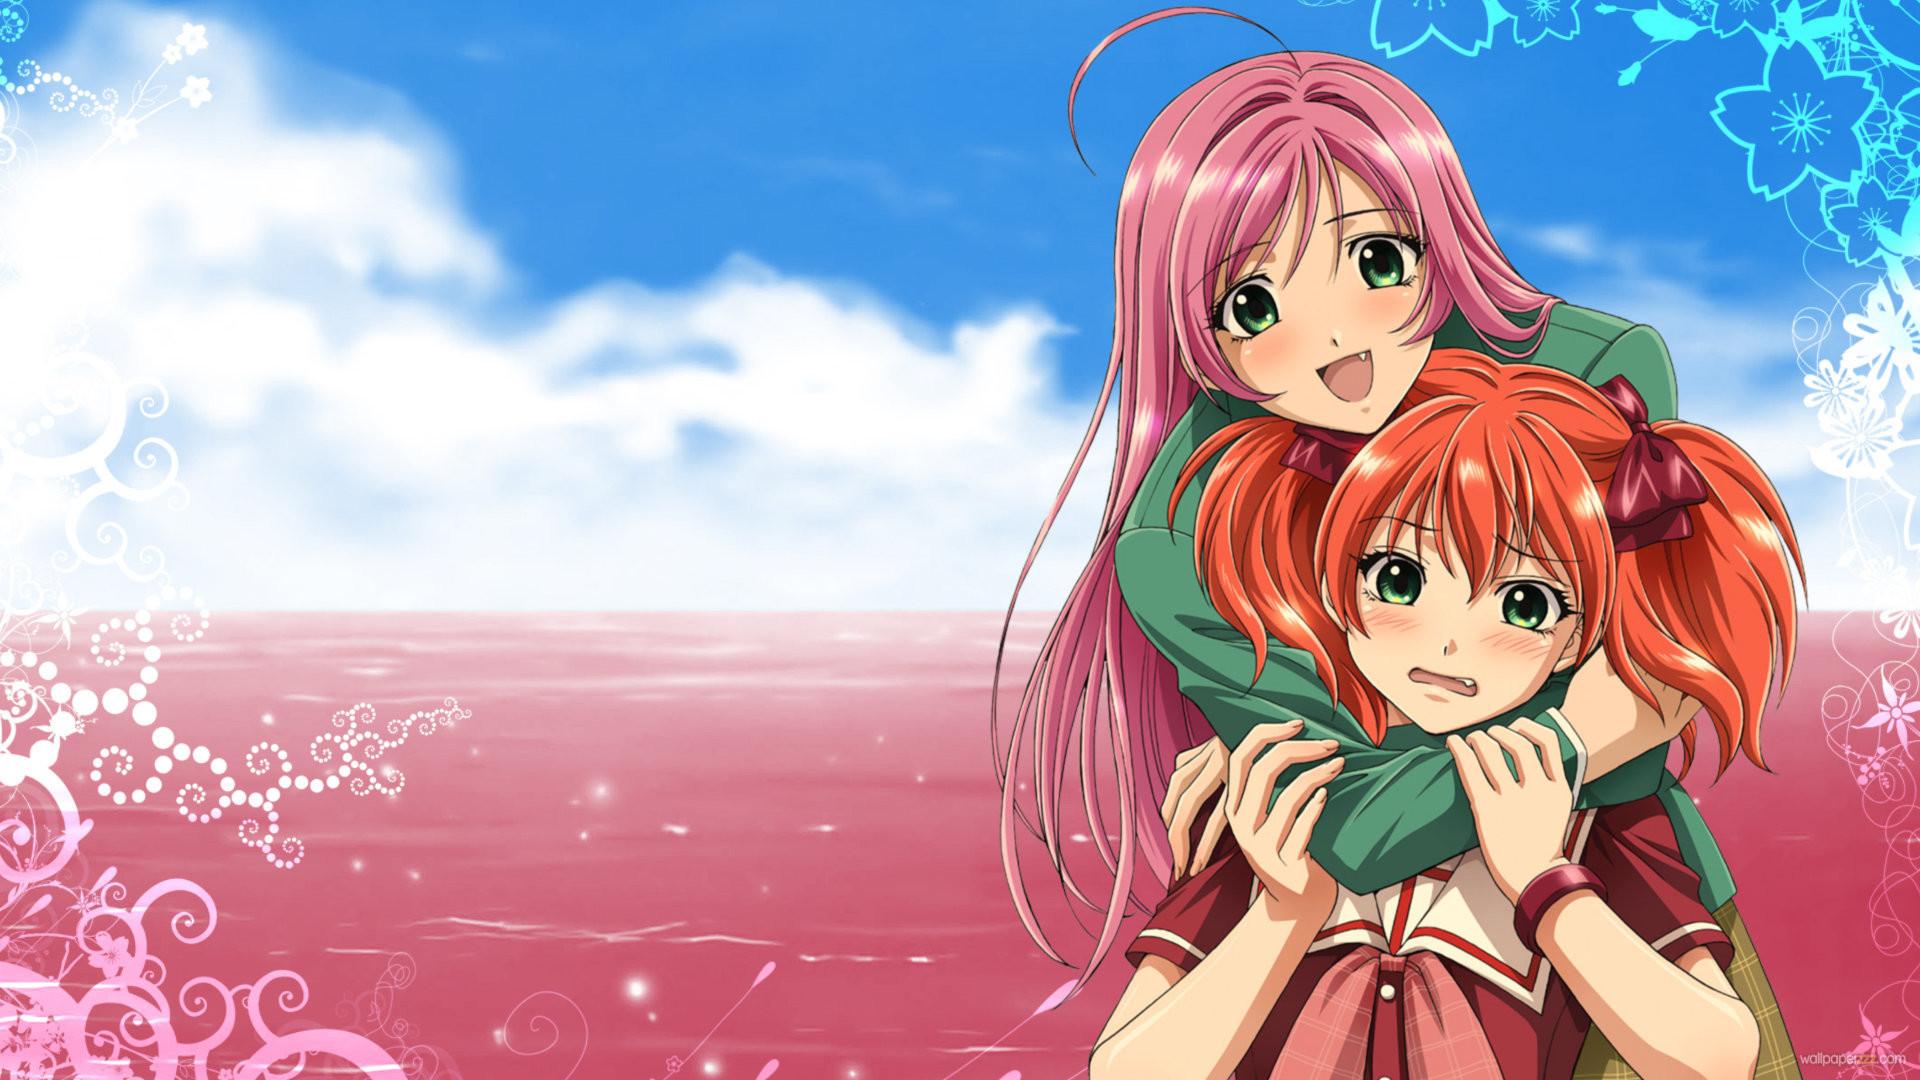 Anime Wallpapers | wallpaper, wallpaper hd, background .